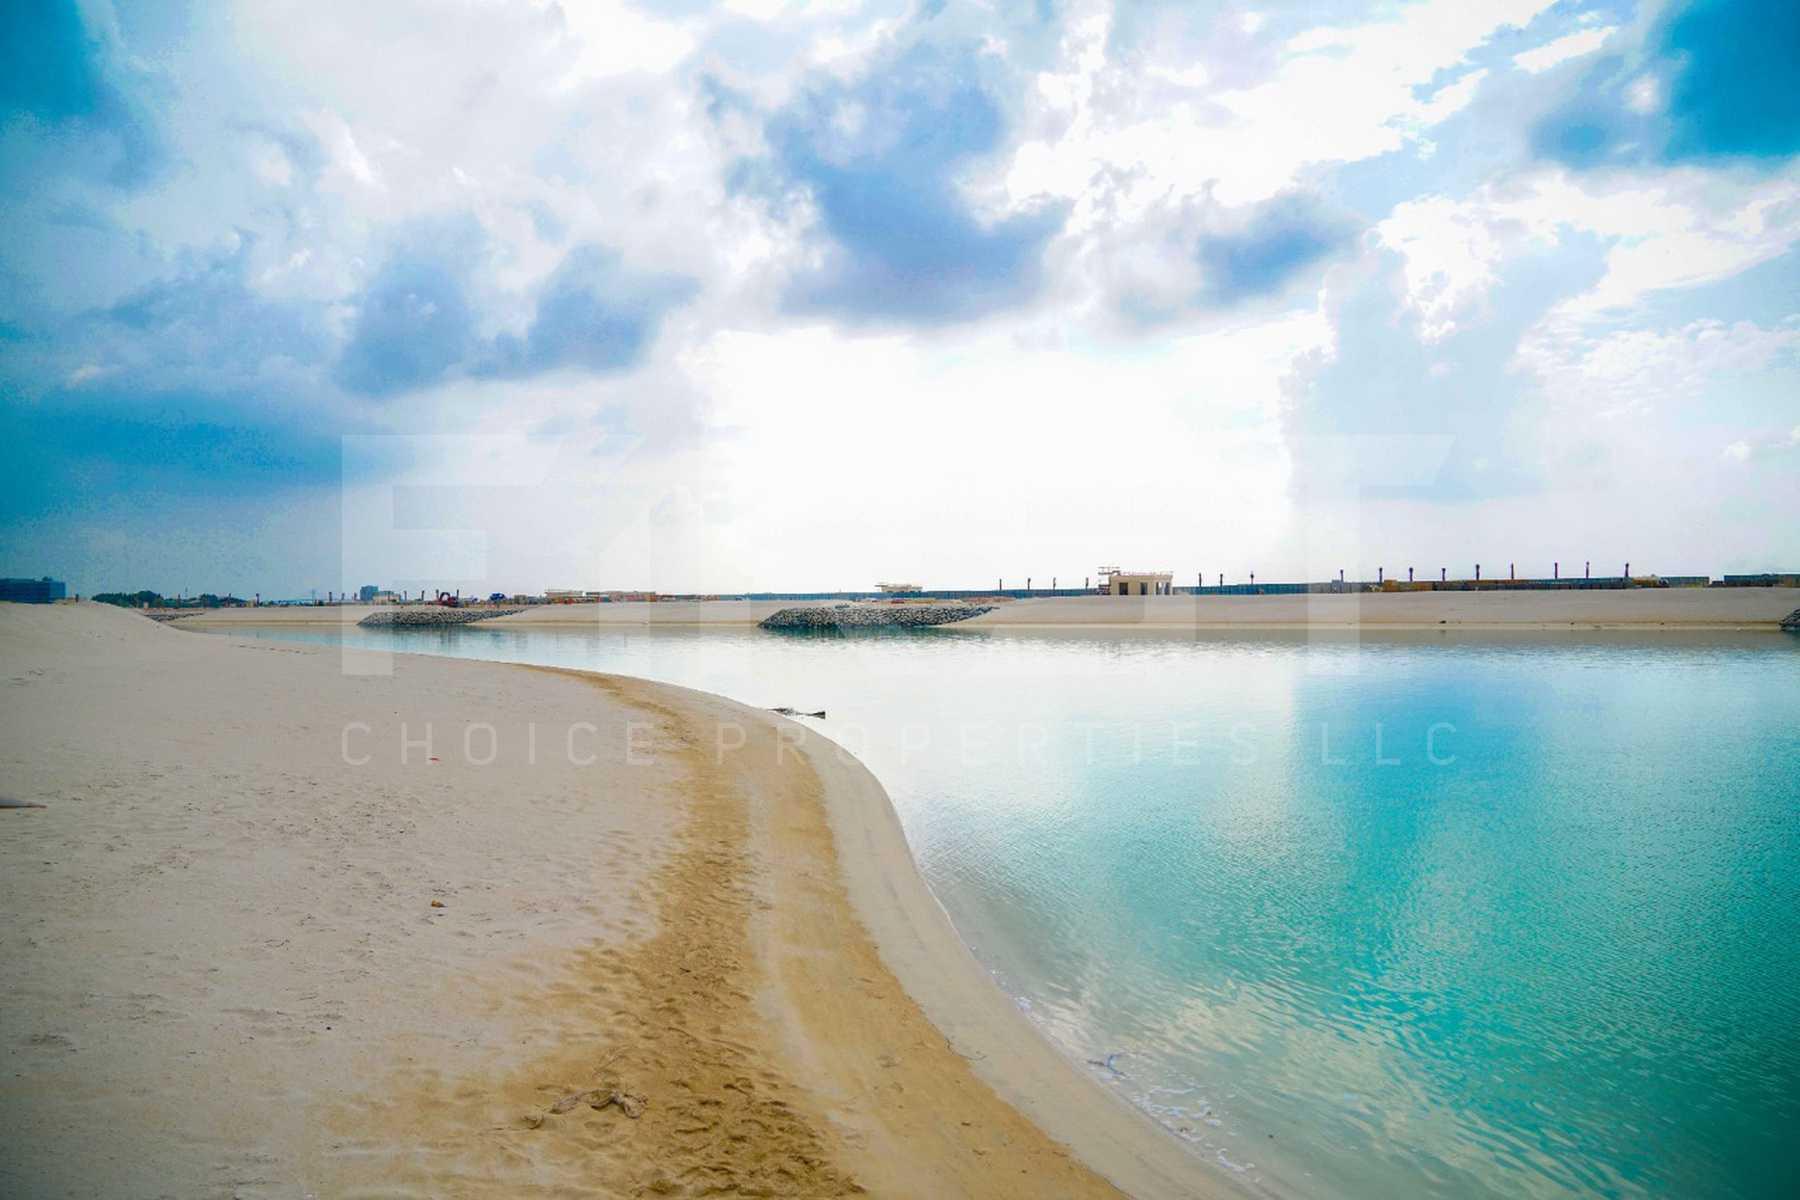 External Photos of NAreel Island Abu Dhabi UAE (3).jpg